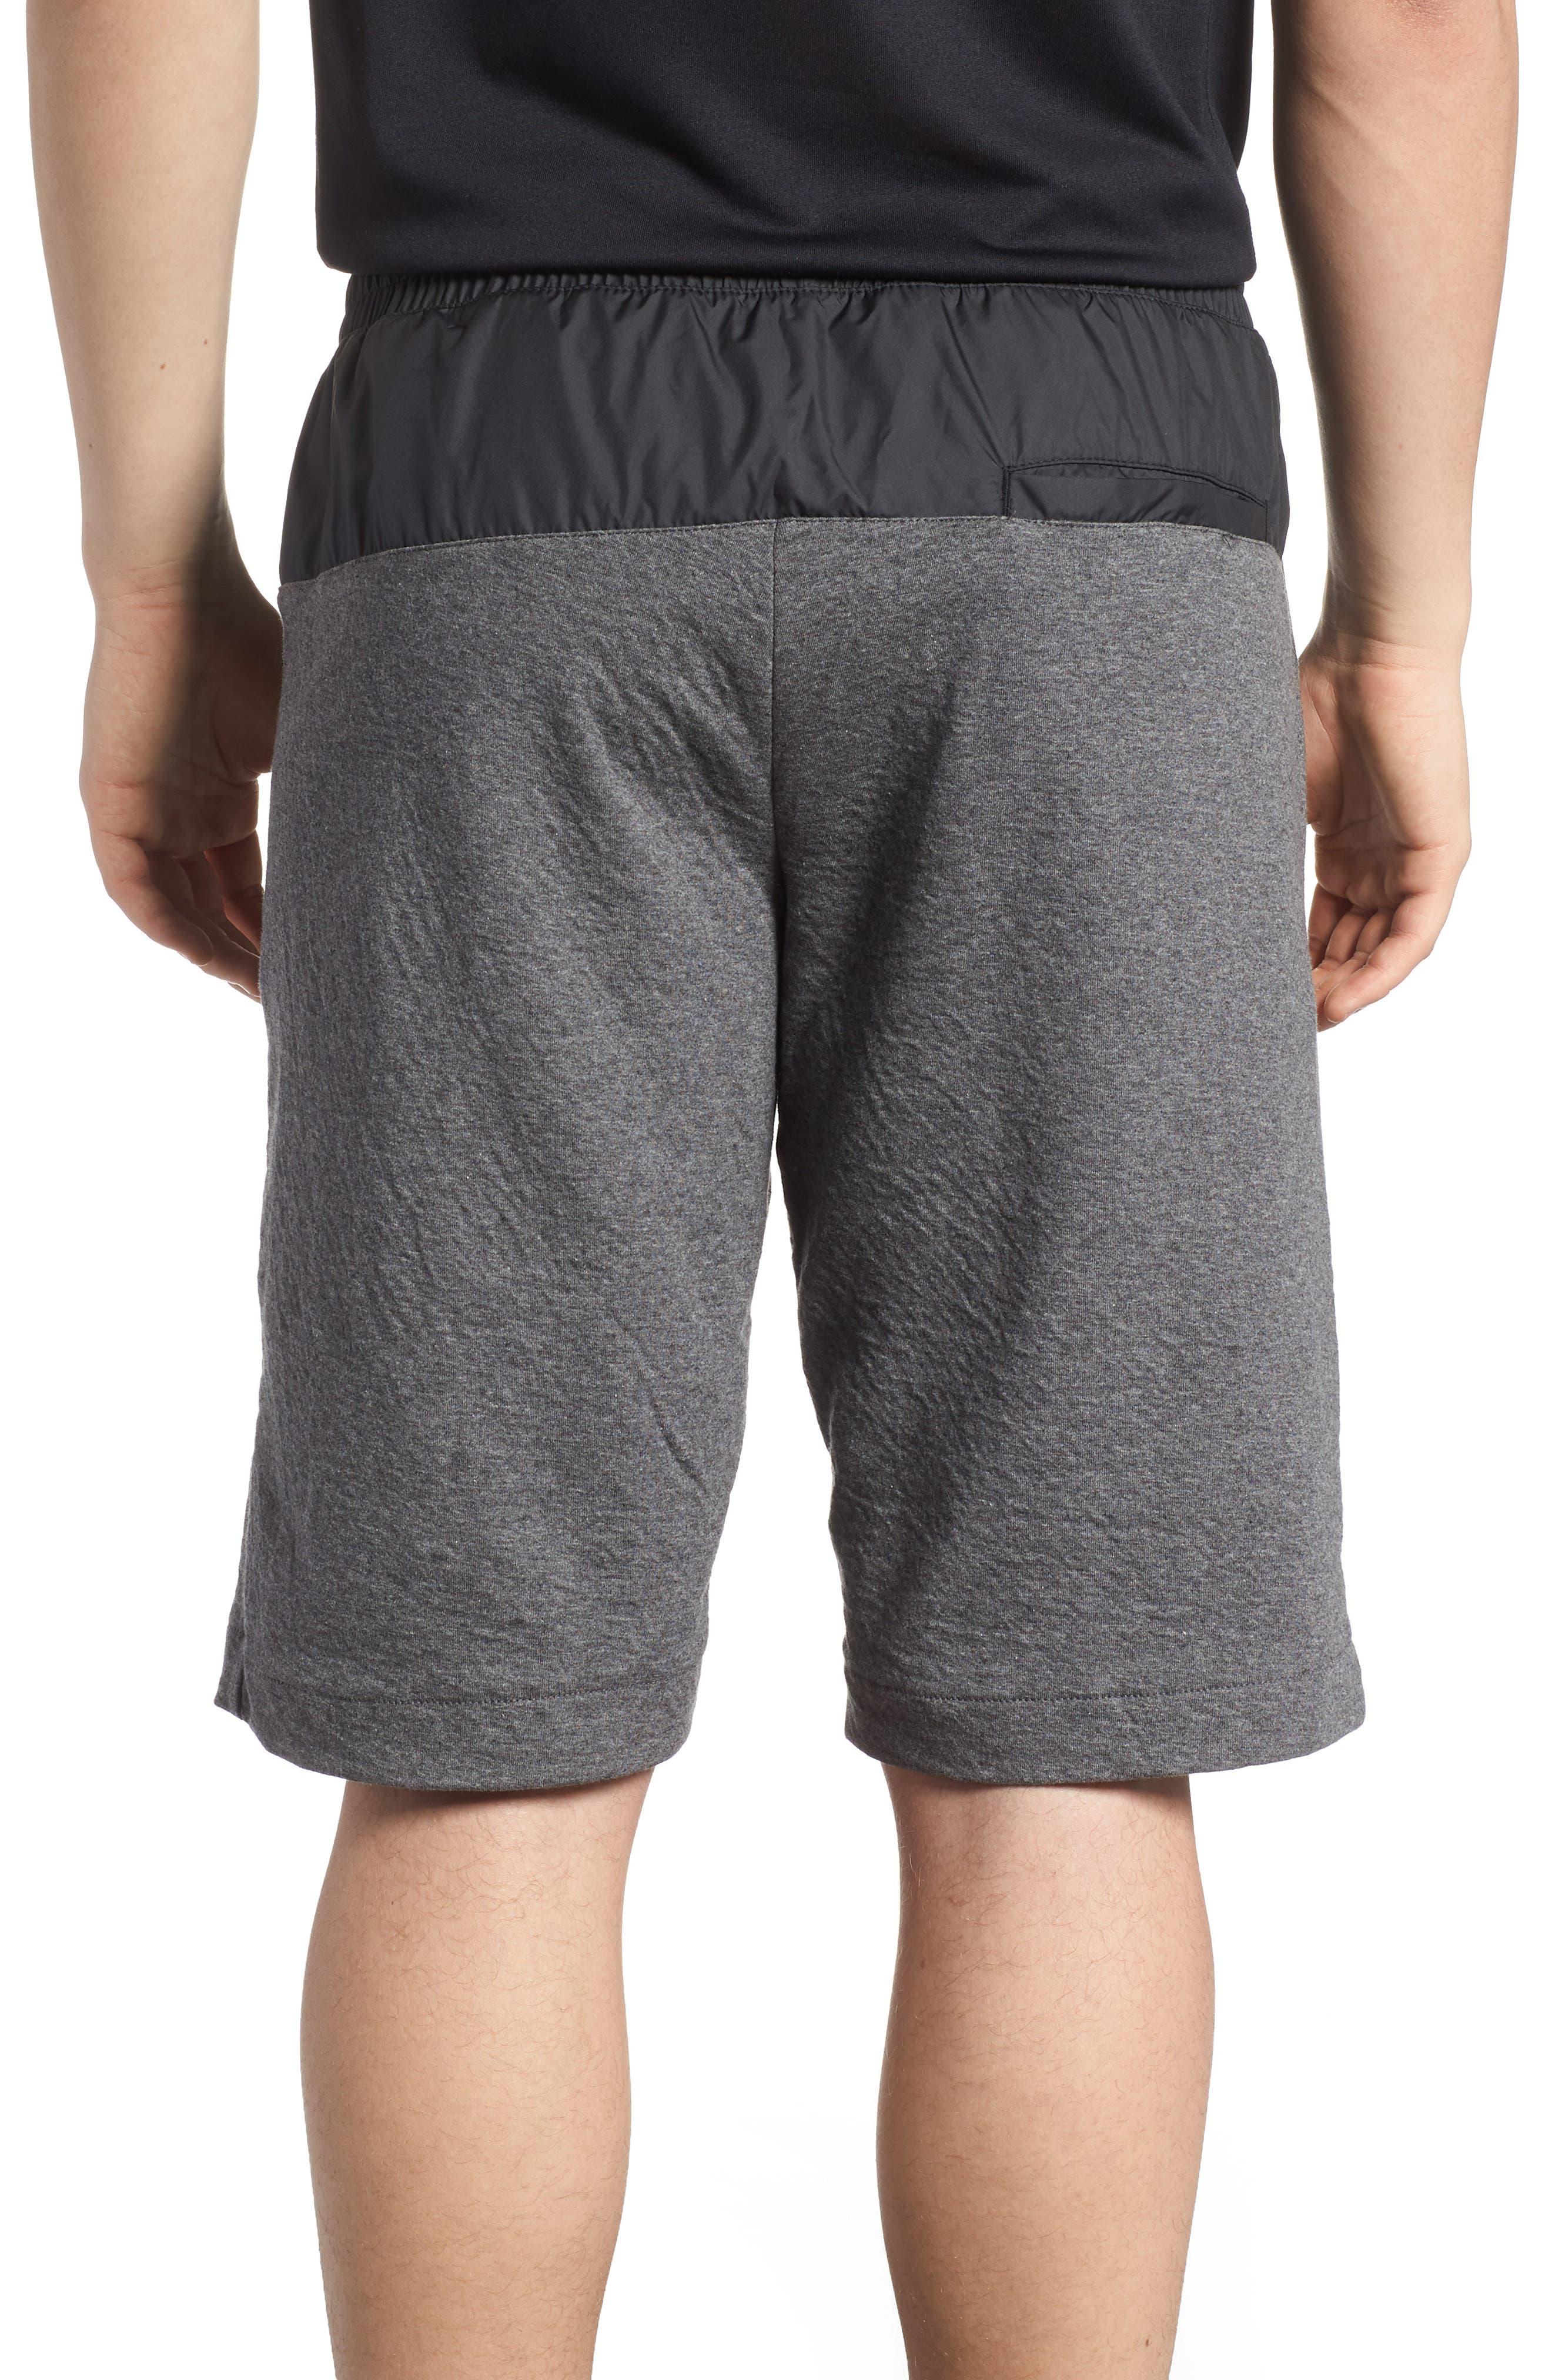 Sportswear Modern Shorts,                             Alternate thumbnail 2, color,                             Charcoal Heather/ Black